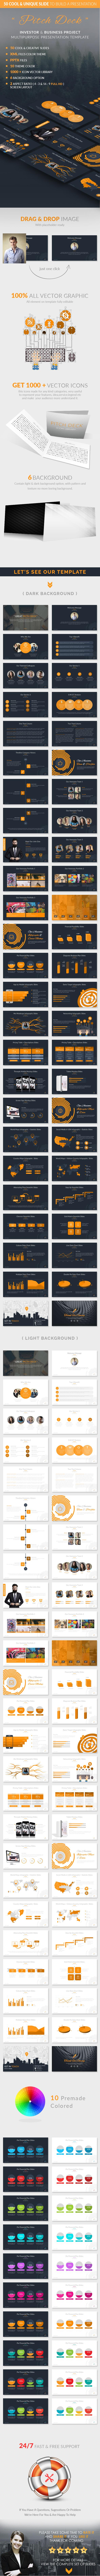 PITCH DECK - Multipurpose Presentation Template - Creative PowerPoint Templates